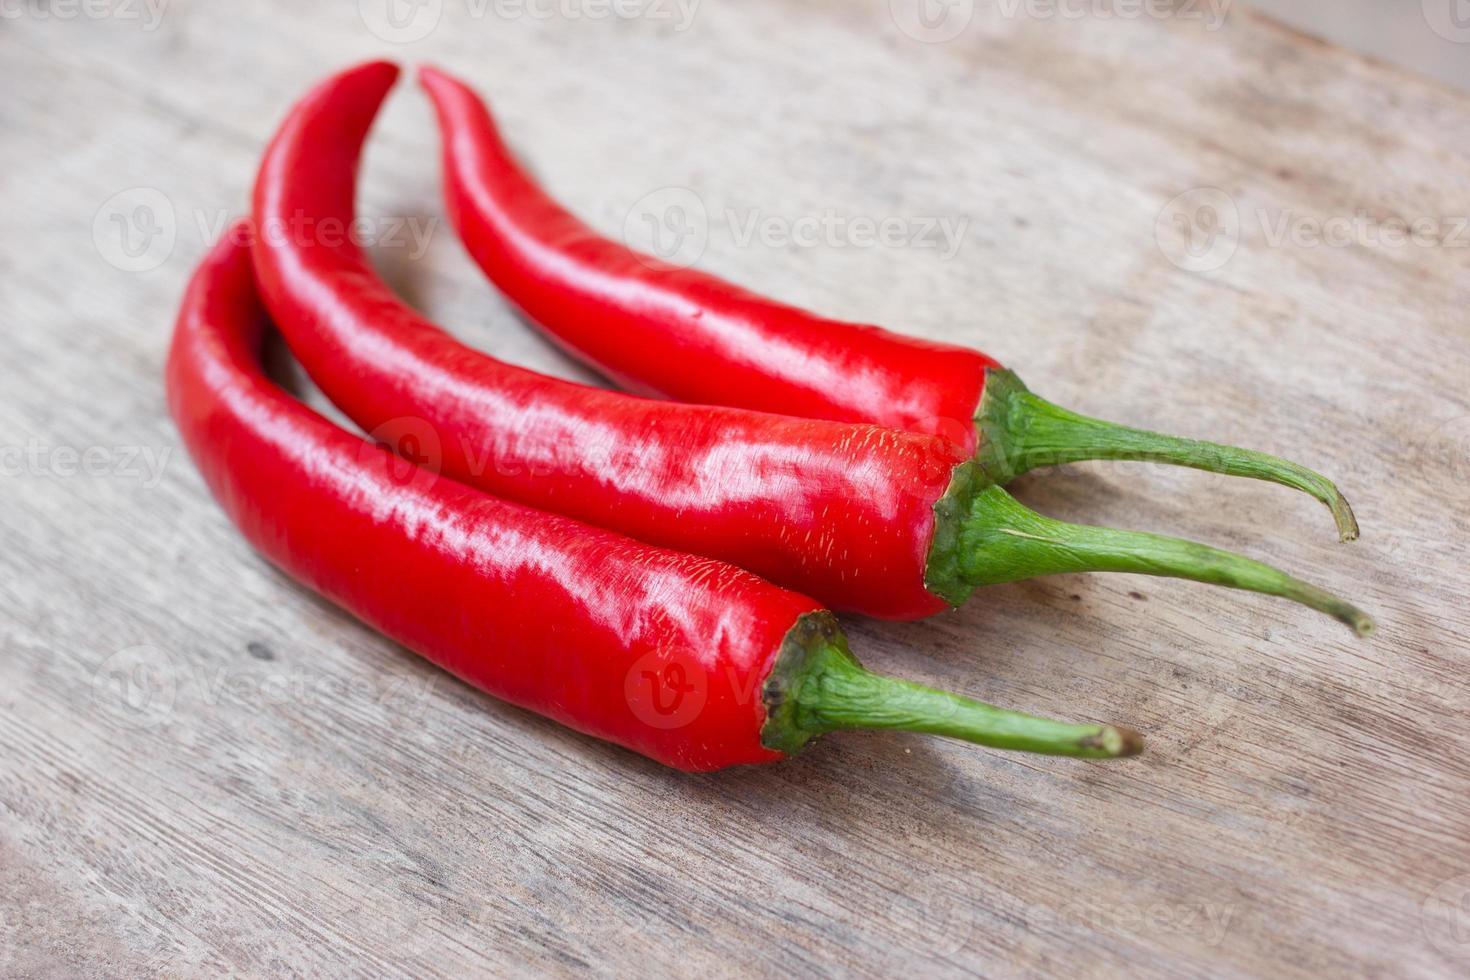 scharfe rote Chili oder Chilischoten foto